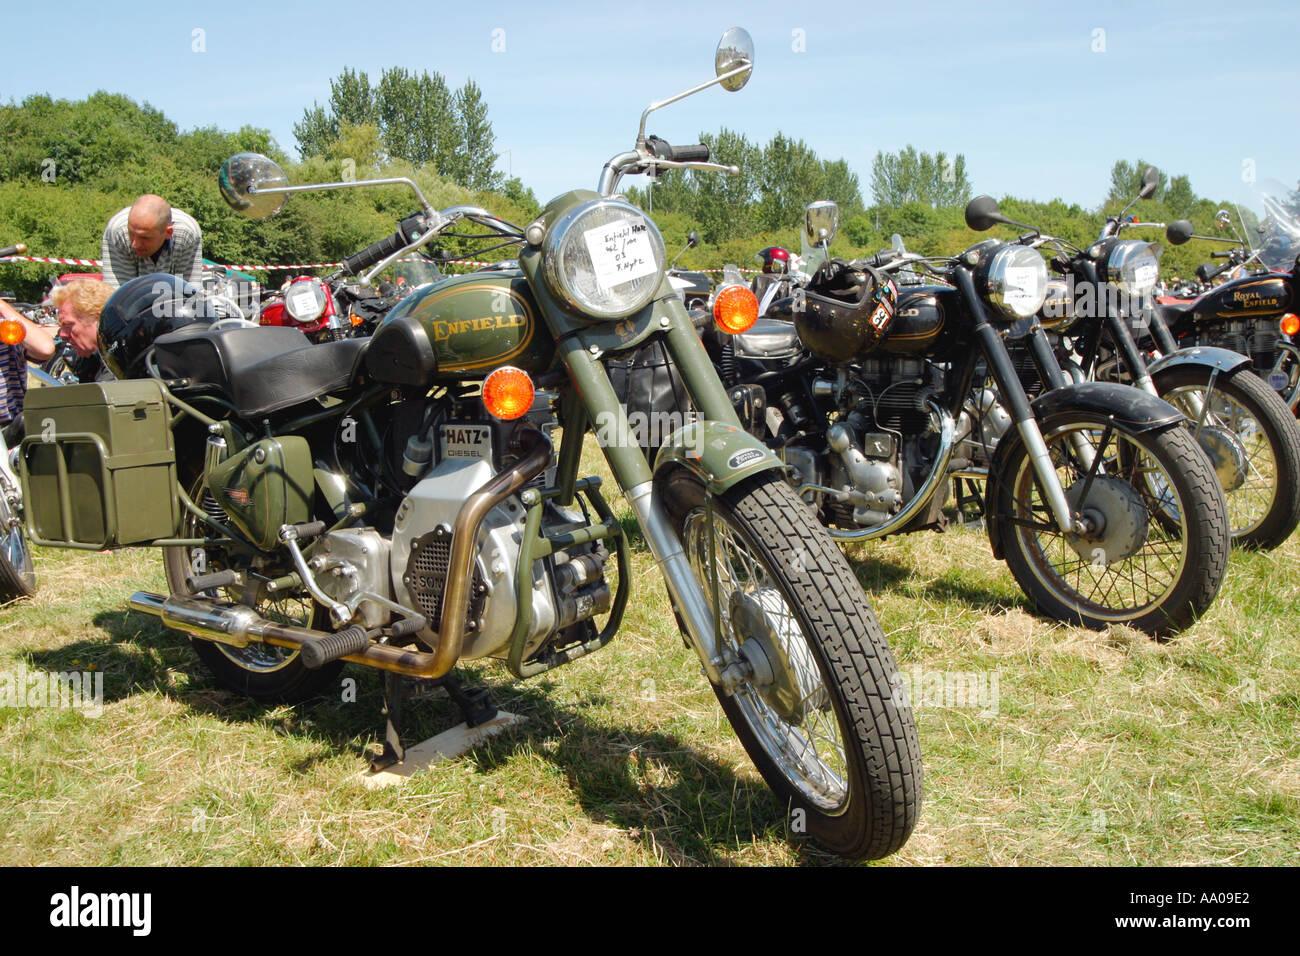 Hatz Stock Photos Images Alamy Engine Diagram Royal Enfield 462 Diesel Motorcycle Motorbike Image